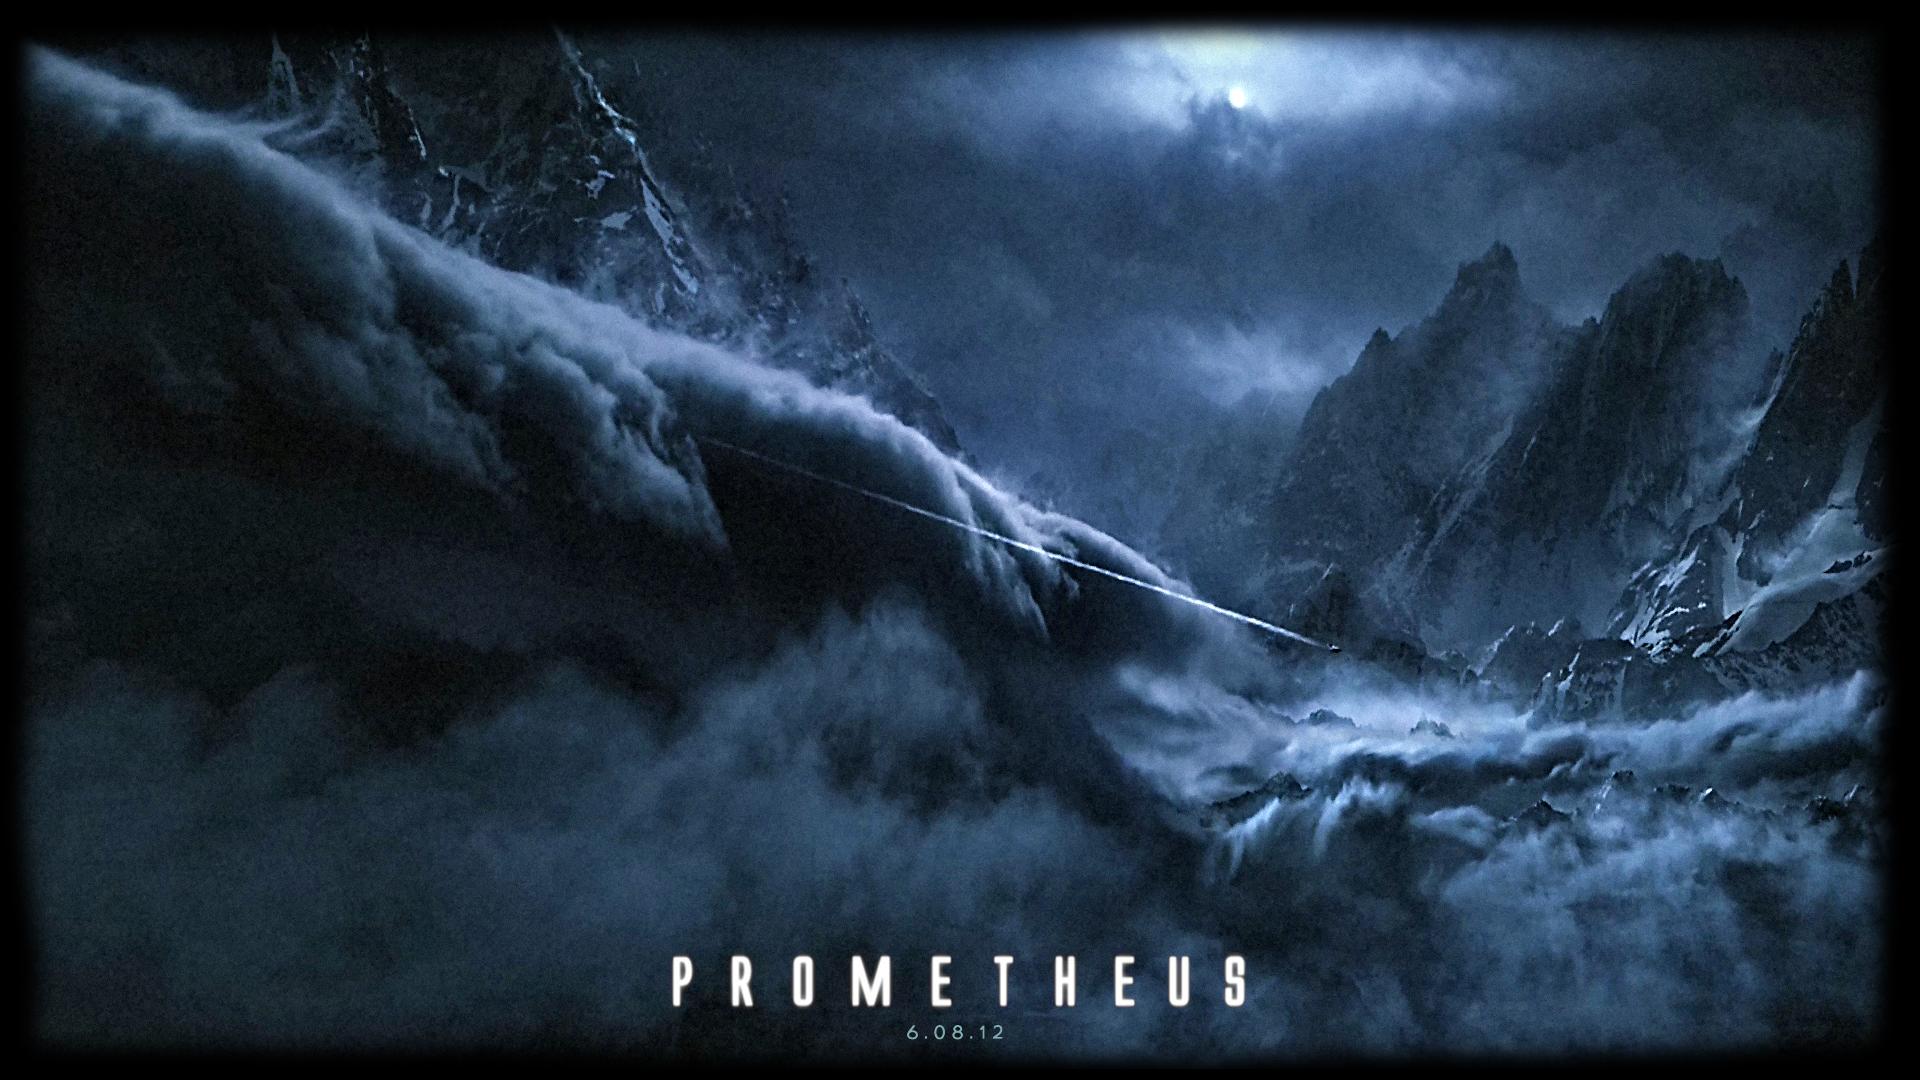 Prometheus Hd Wallpaper Background Image 1920x1080 Id446410